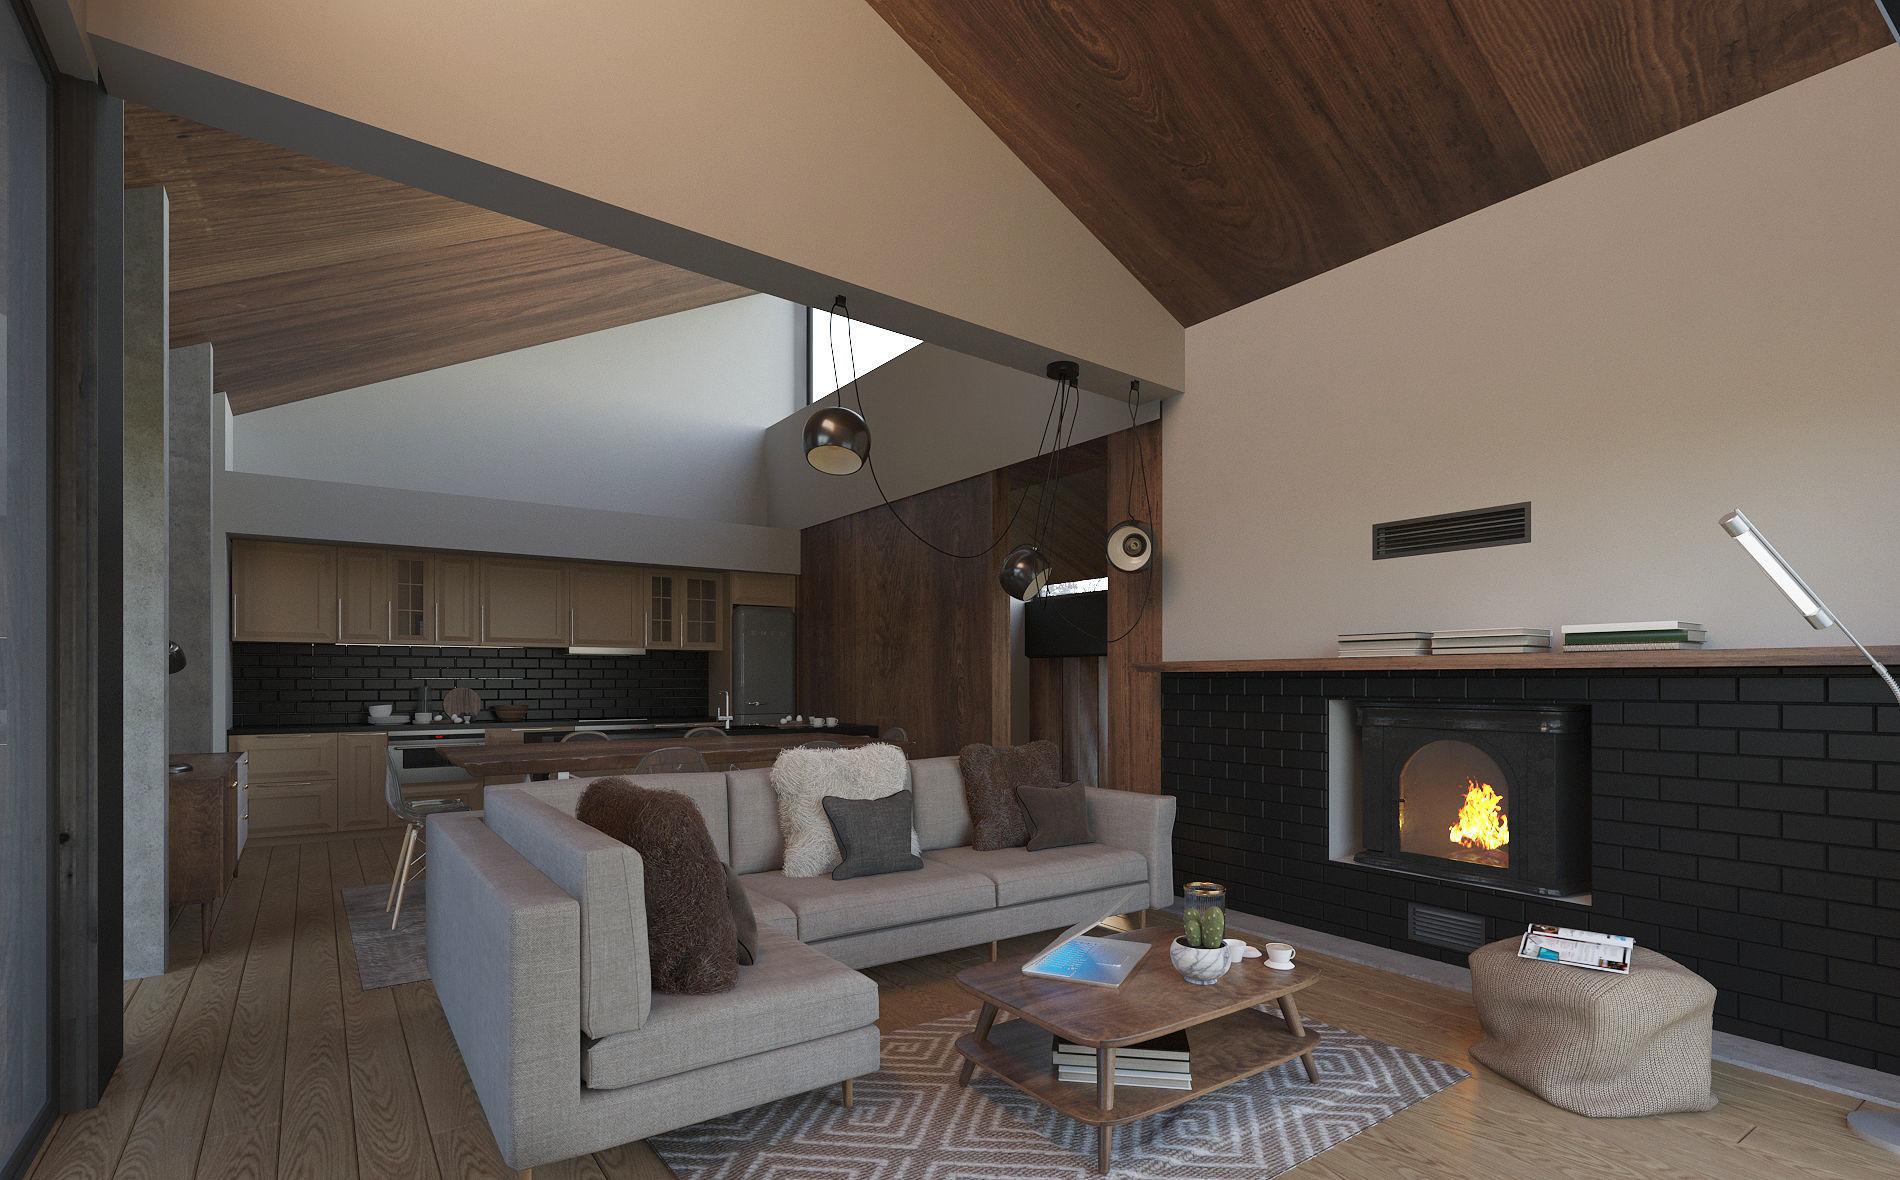 Winter Cabin House Living Room